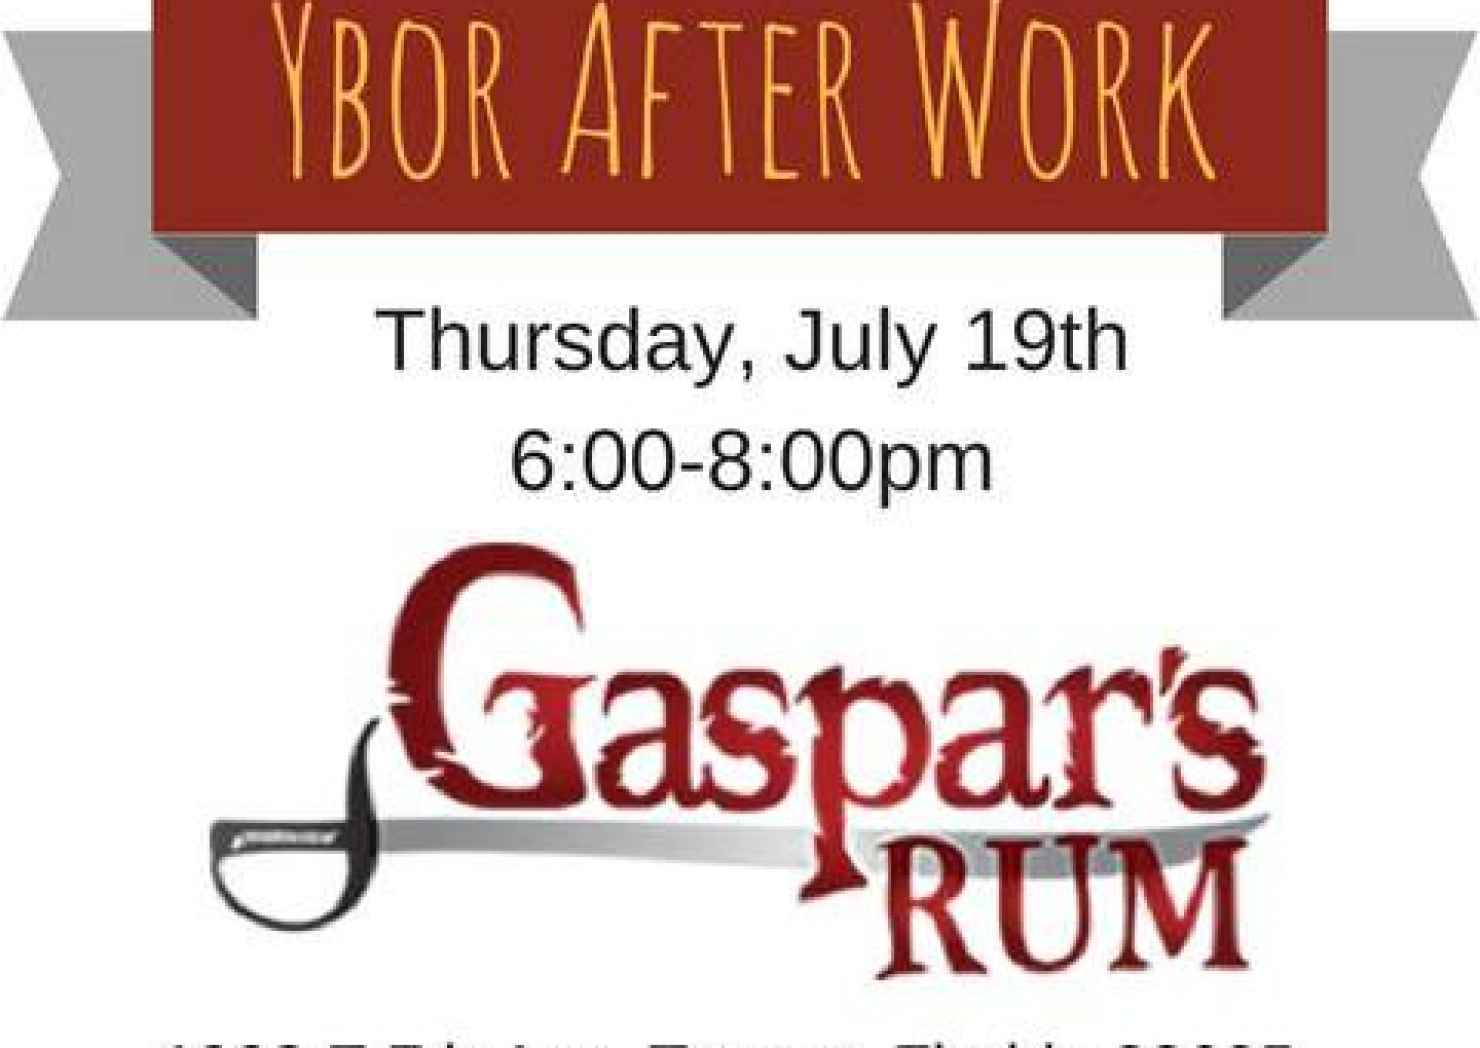 Ybor After Work at Tampa Bay Rum Company